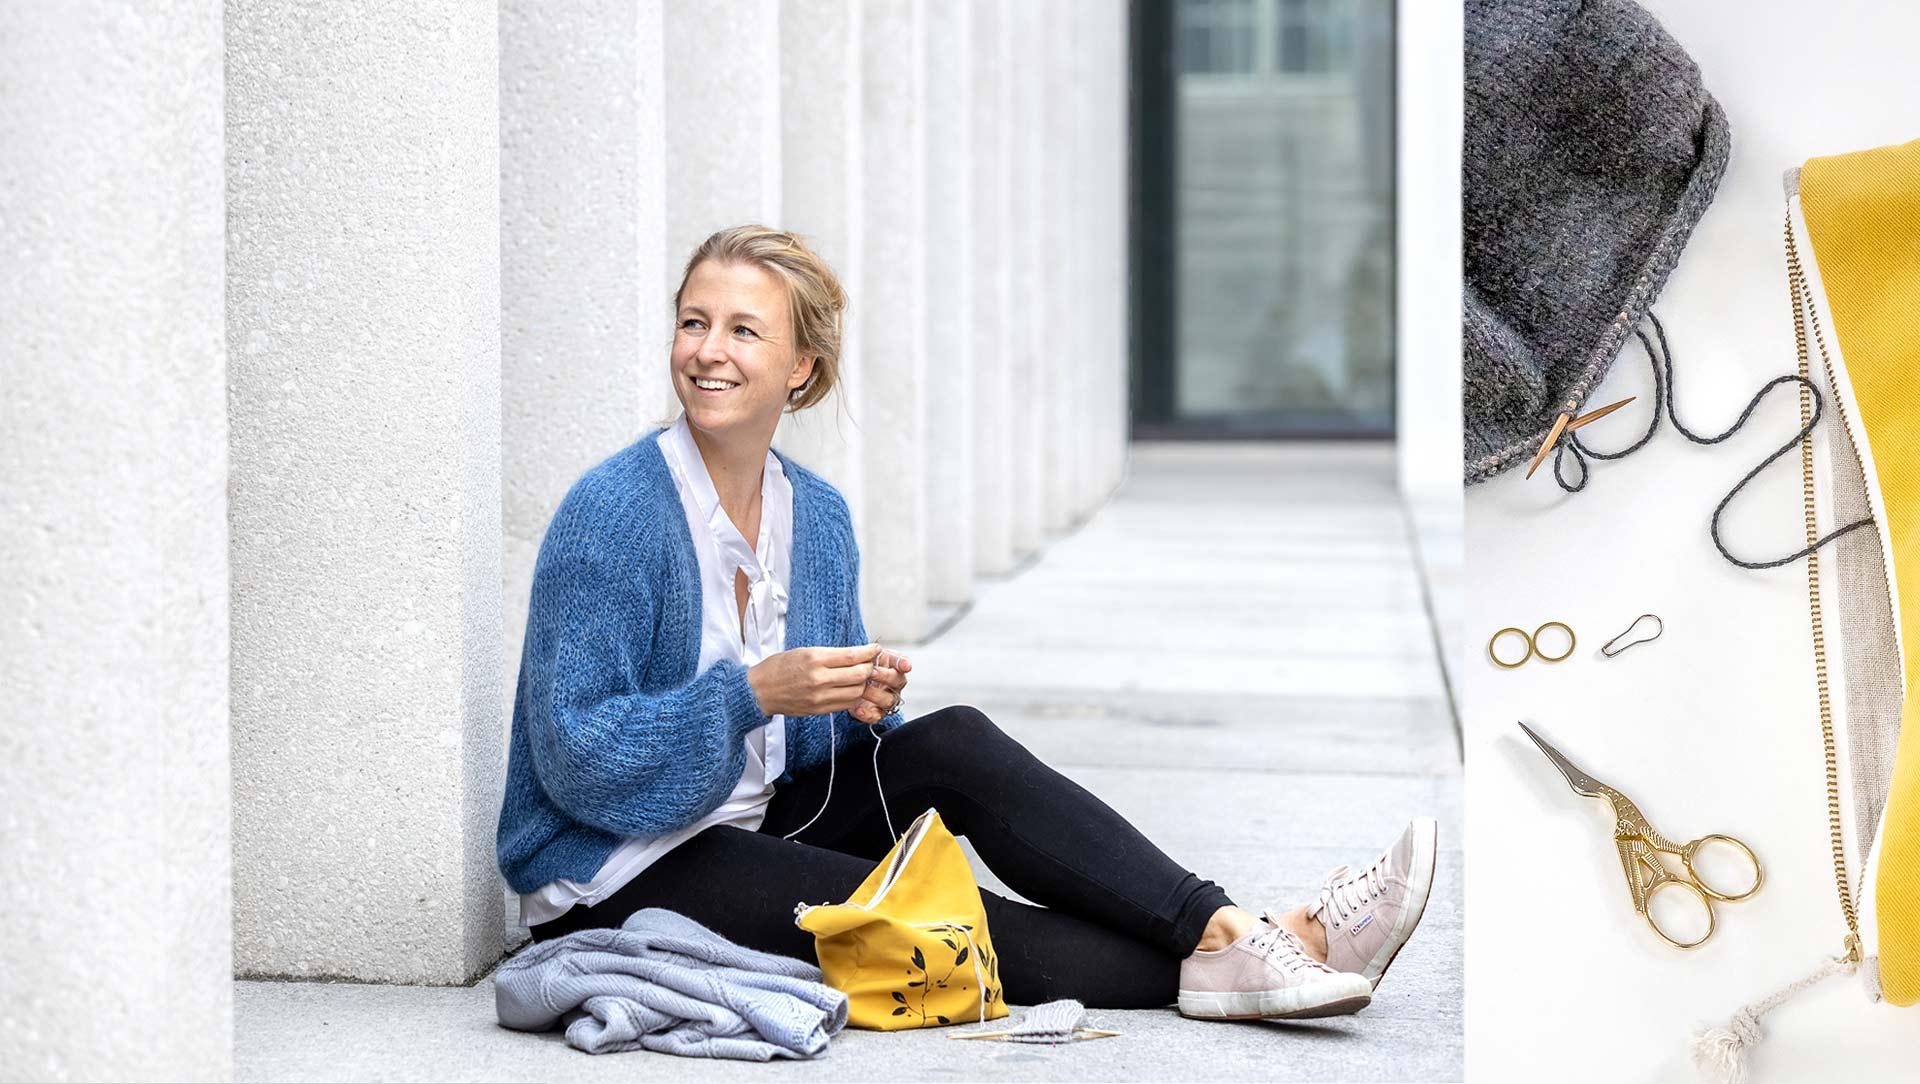 businessportrait-outdoor-social-media